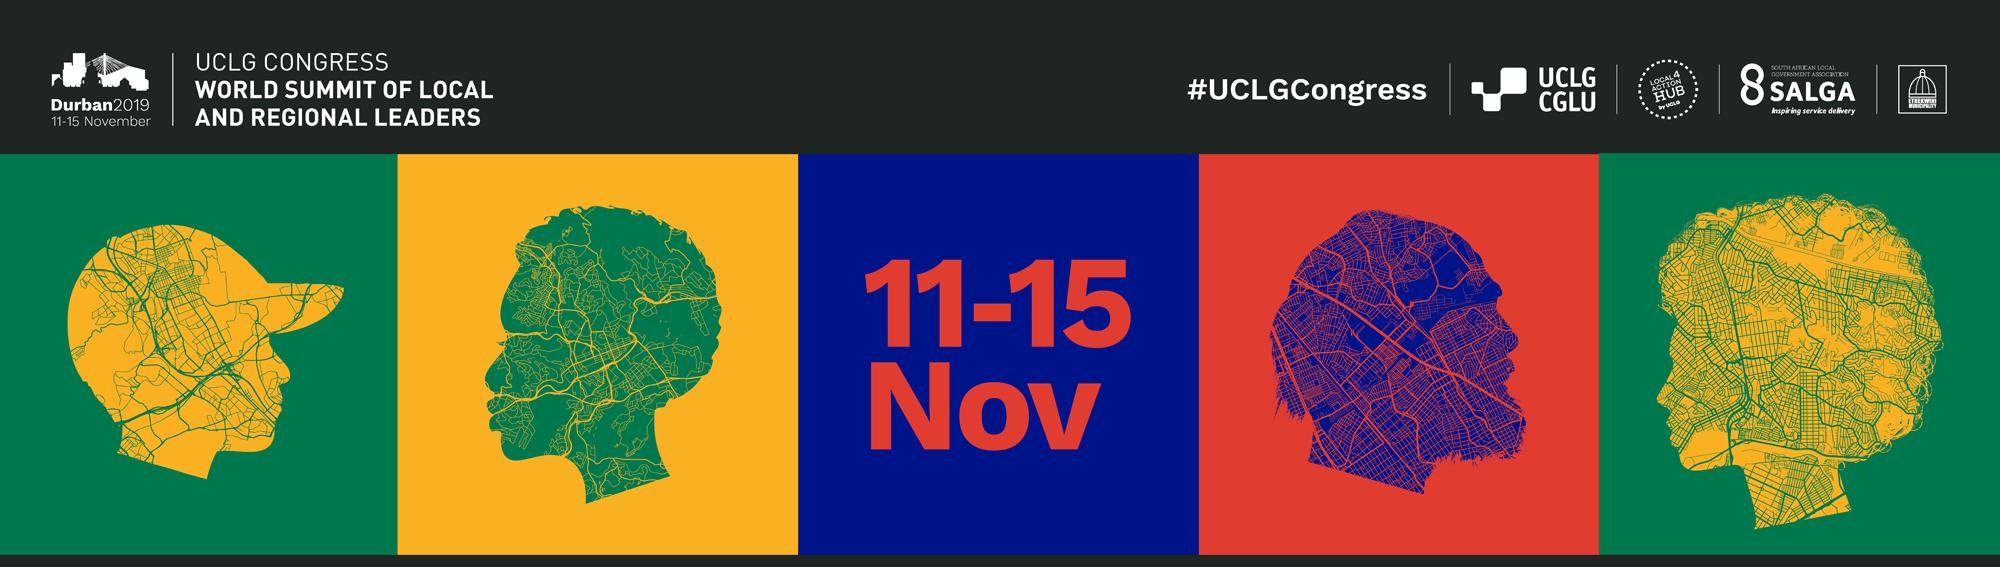 UCLG Congress Durban 2019